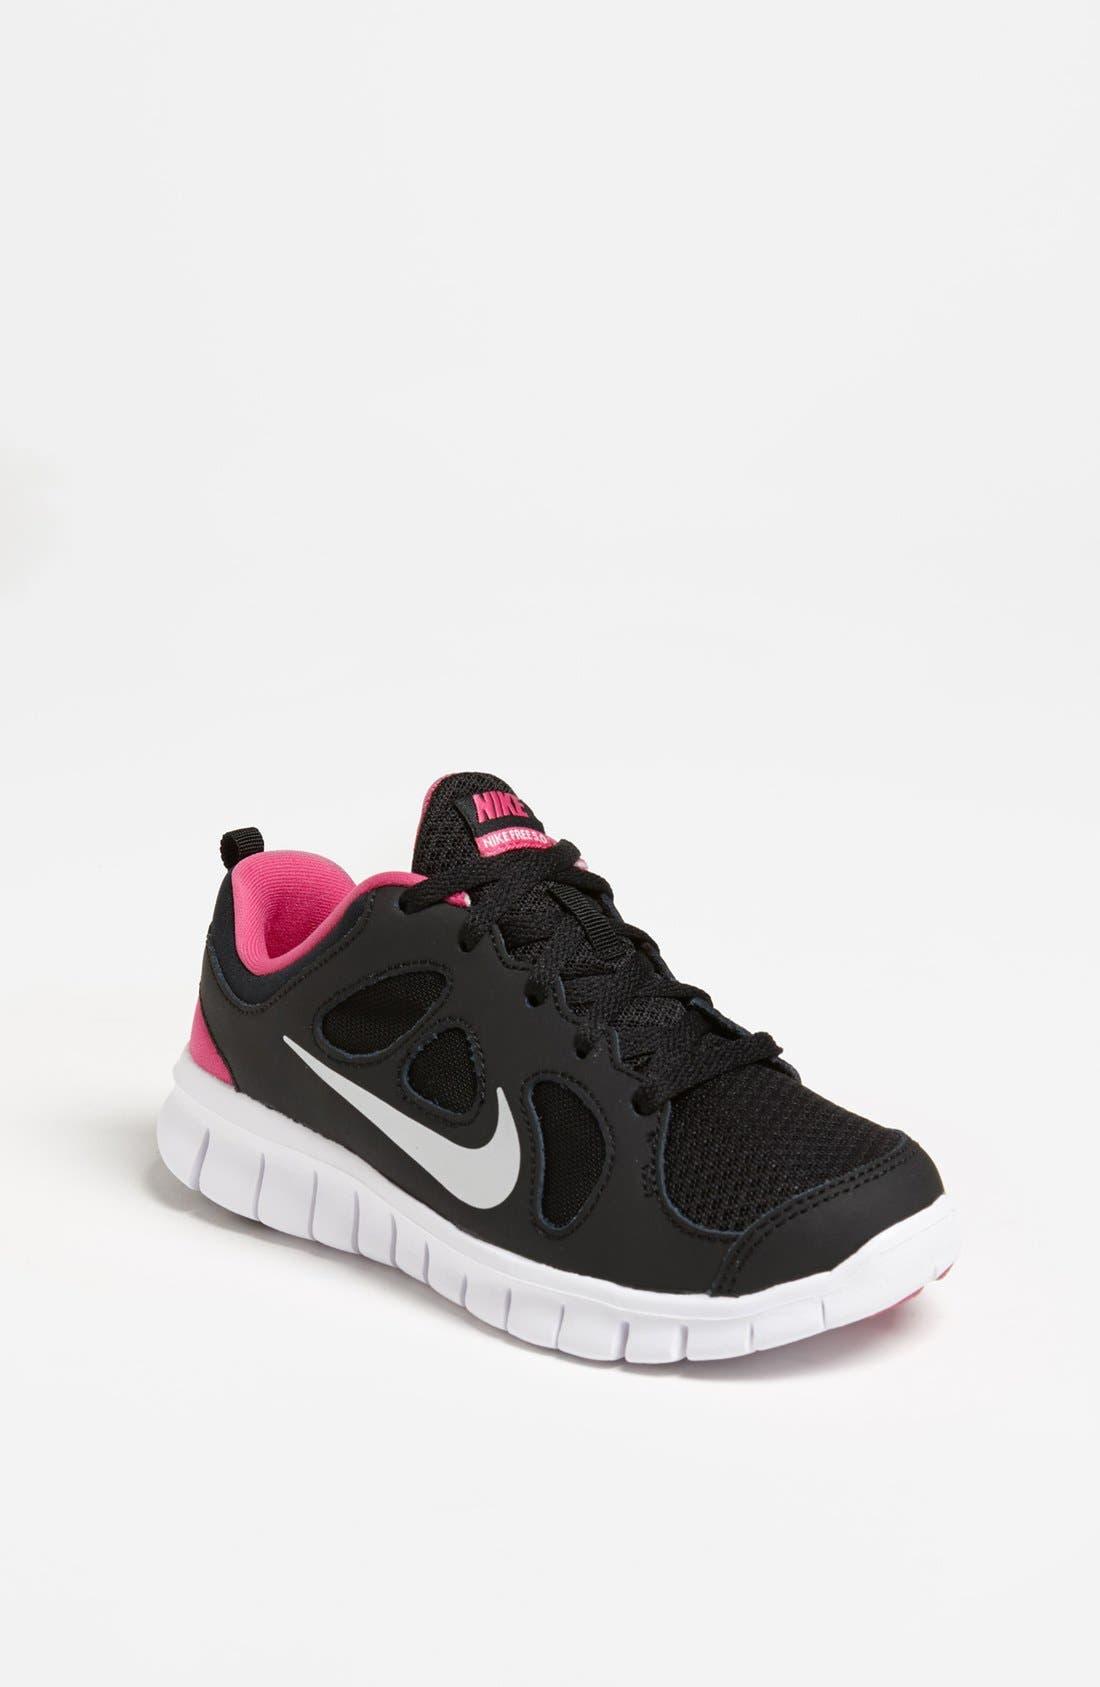 Nike 'Free Run 5.0' Running Shoe